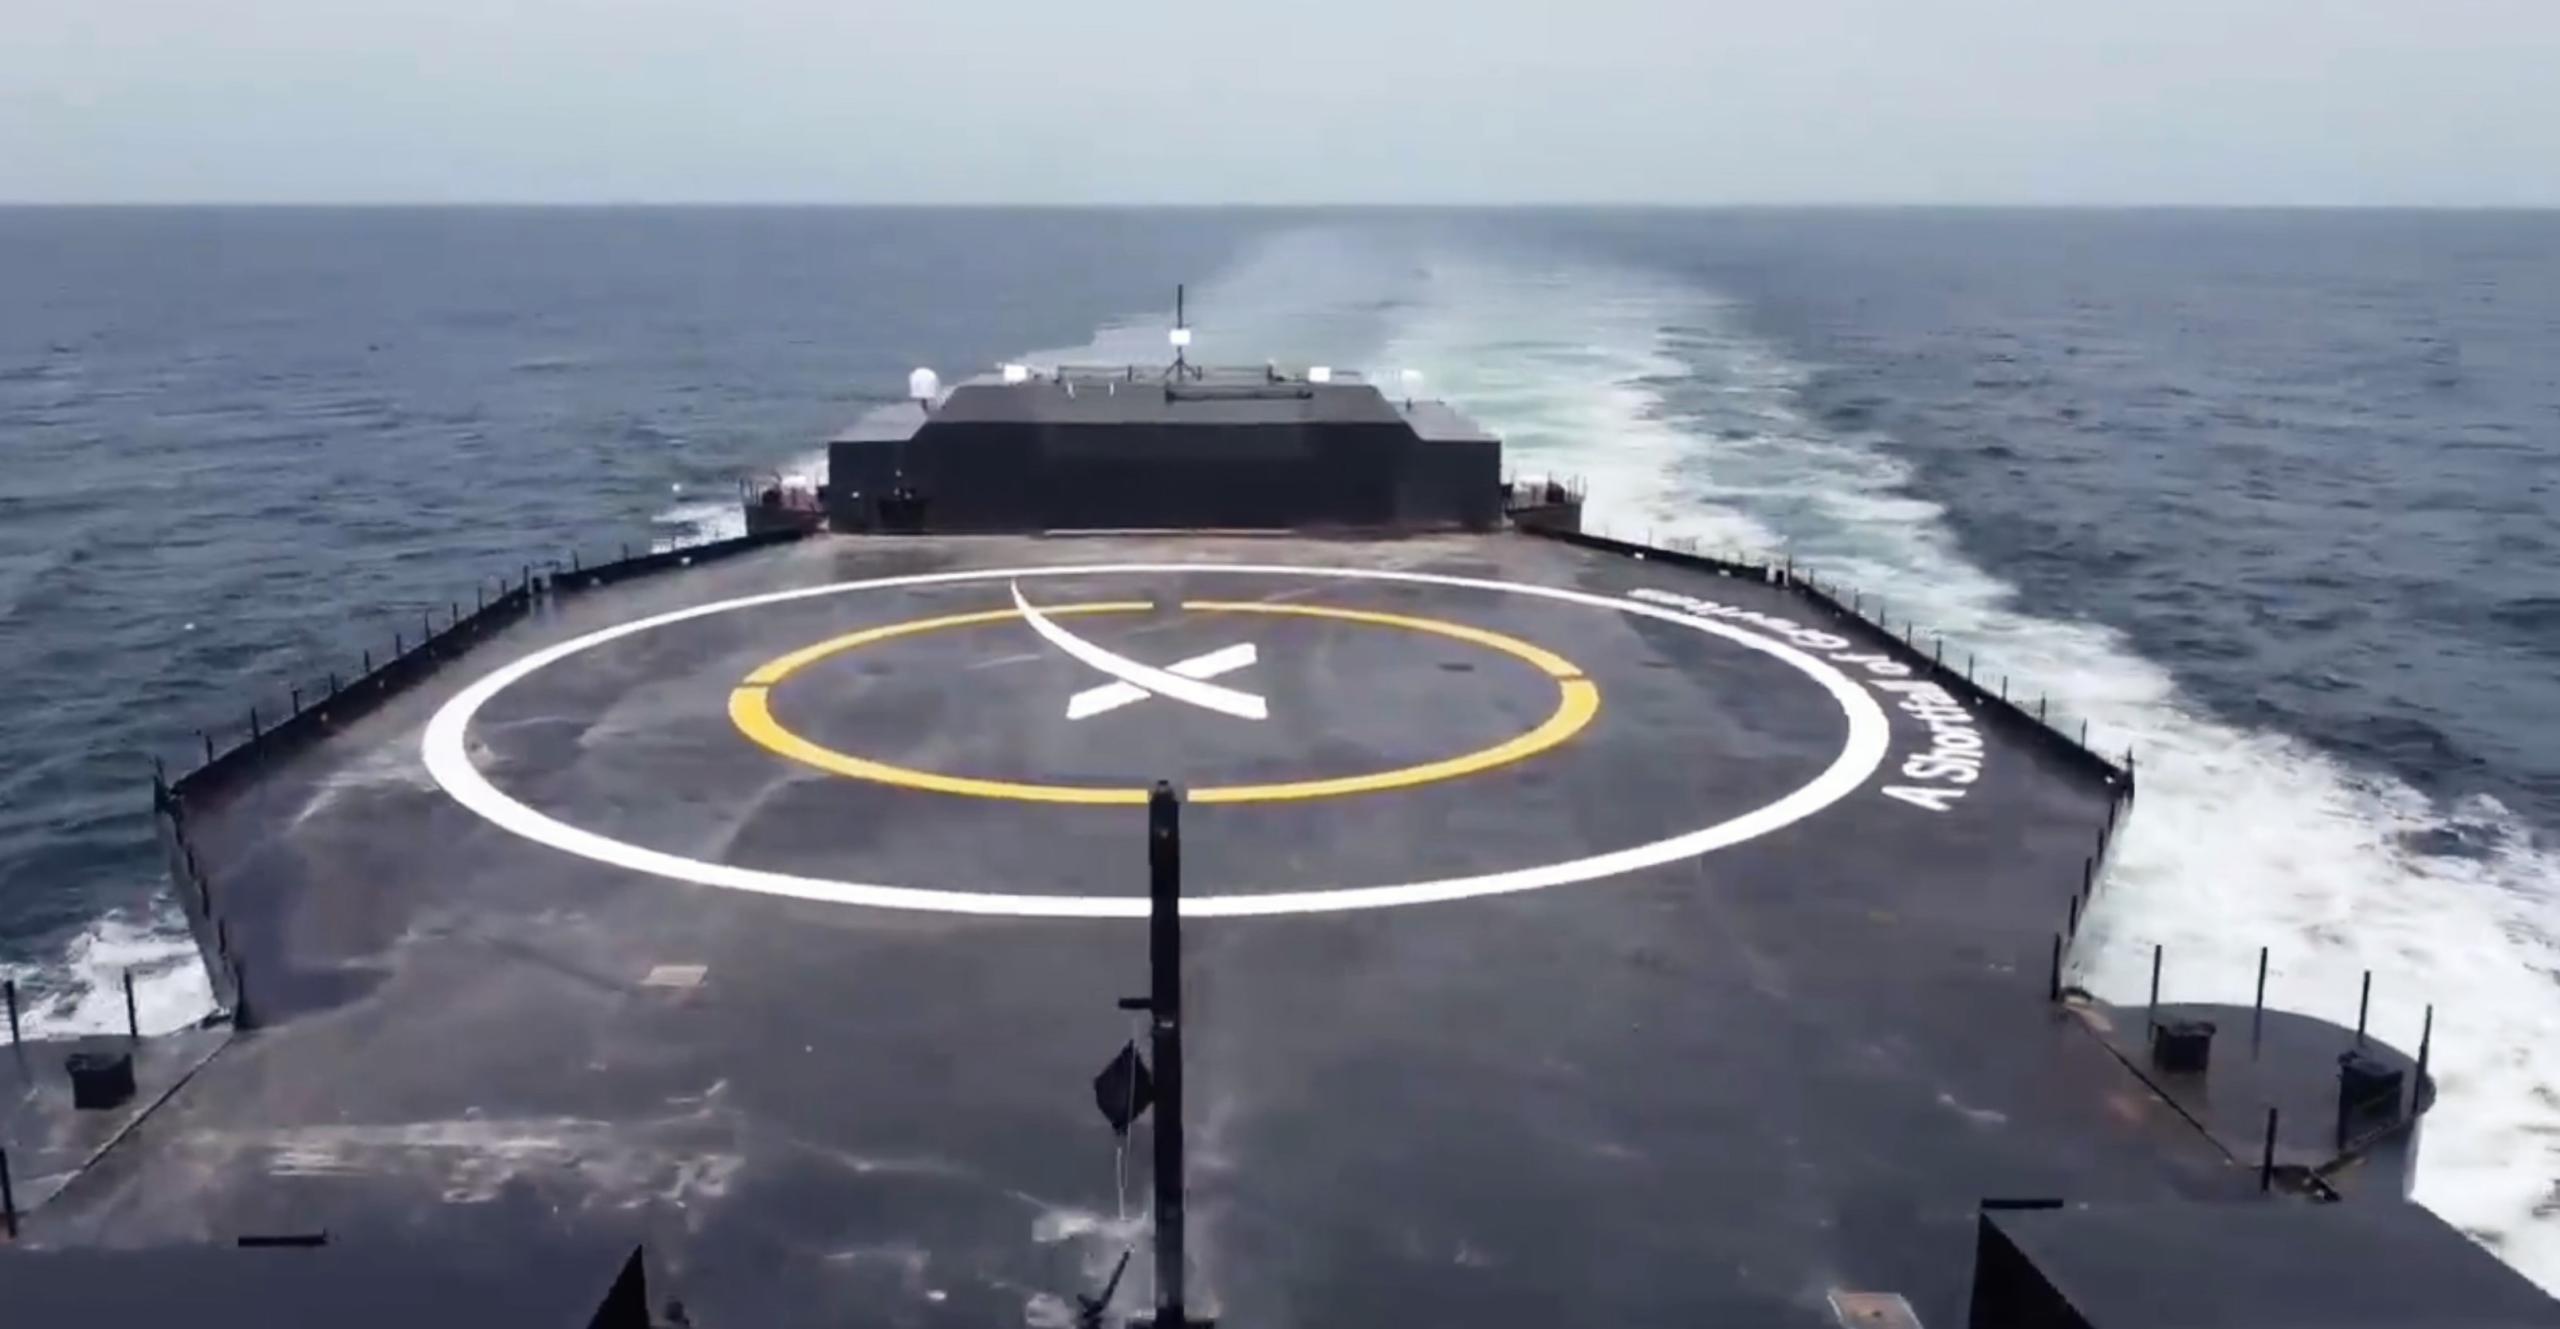 ASOG sea trails 070921 (Elon Musk – SpaceX) 9 (c)